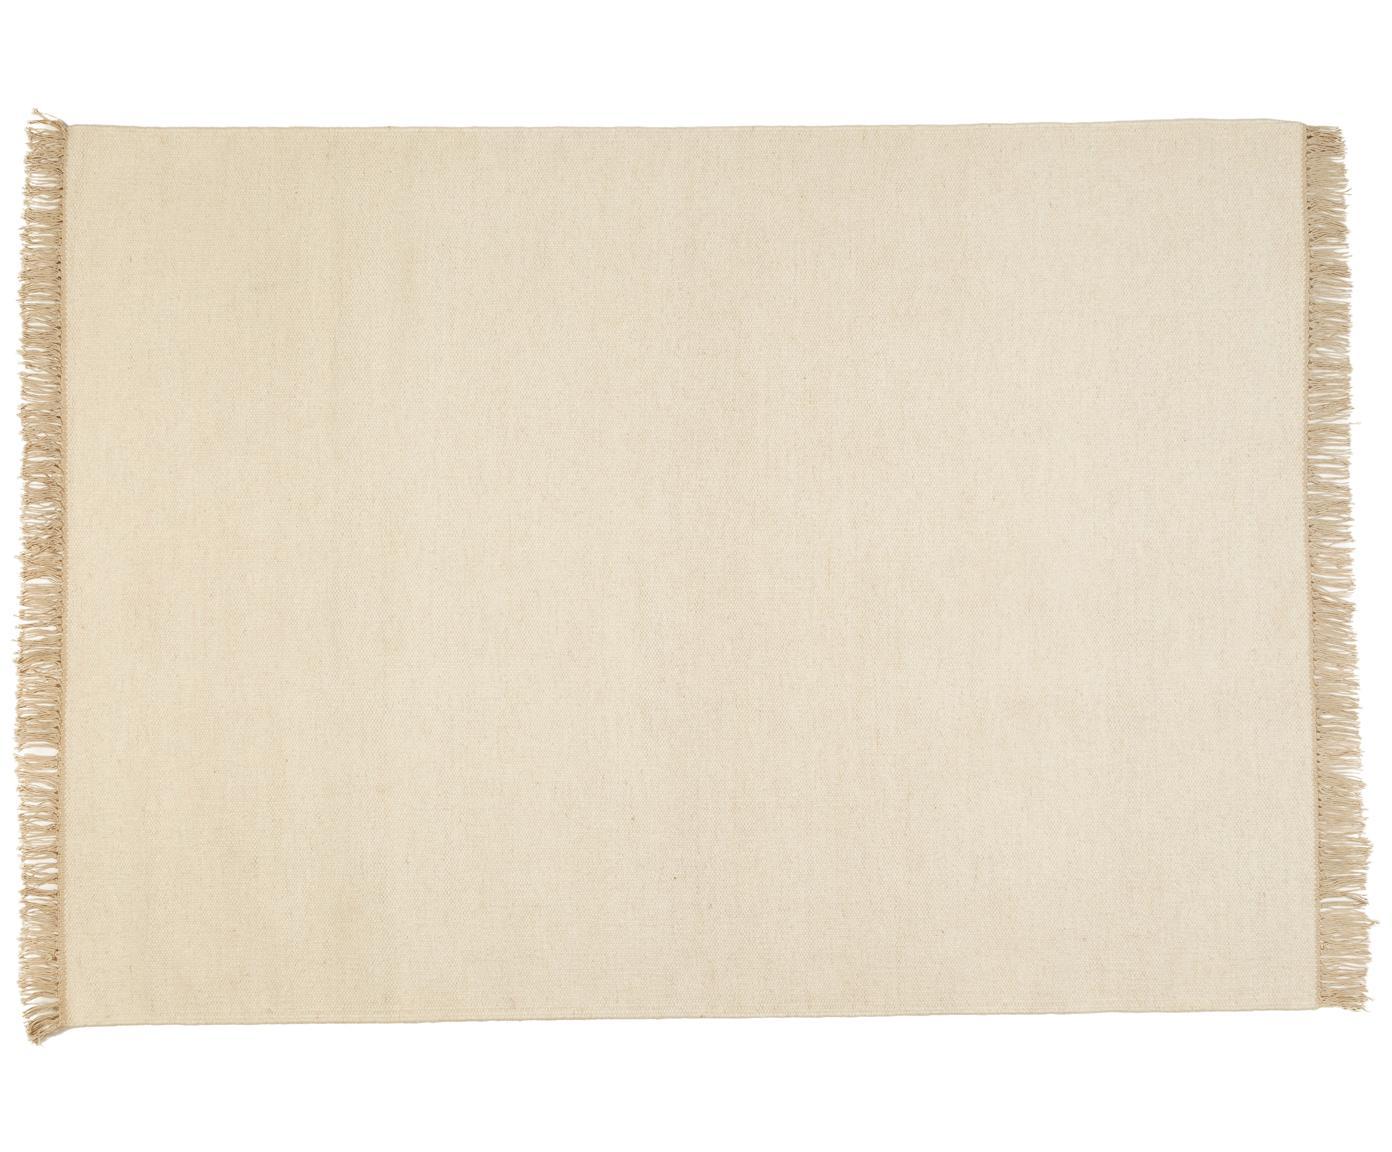 Tappeto in lana tessuto a mano con frange Rainbow, Bianco naturale, Larg. 140 x Lung. 200 cm (taglia S)